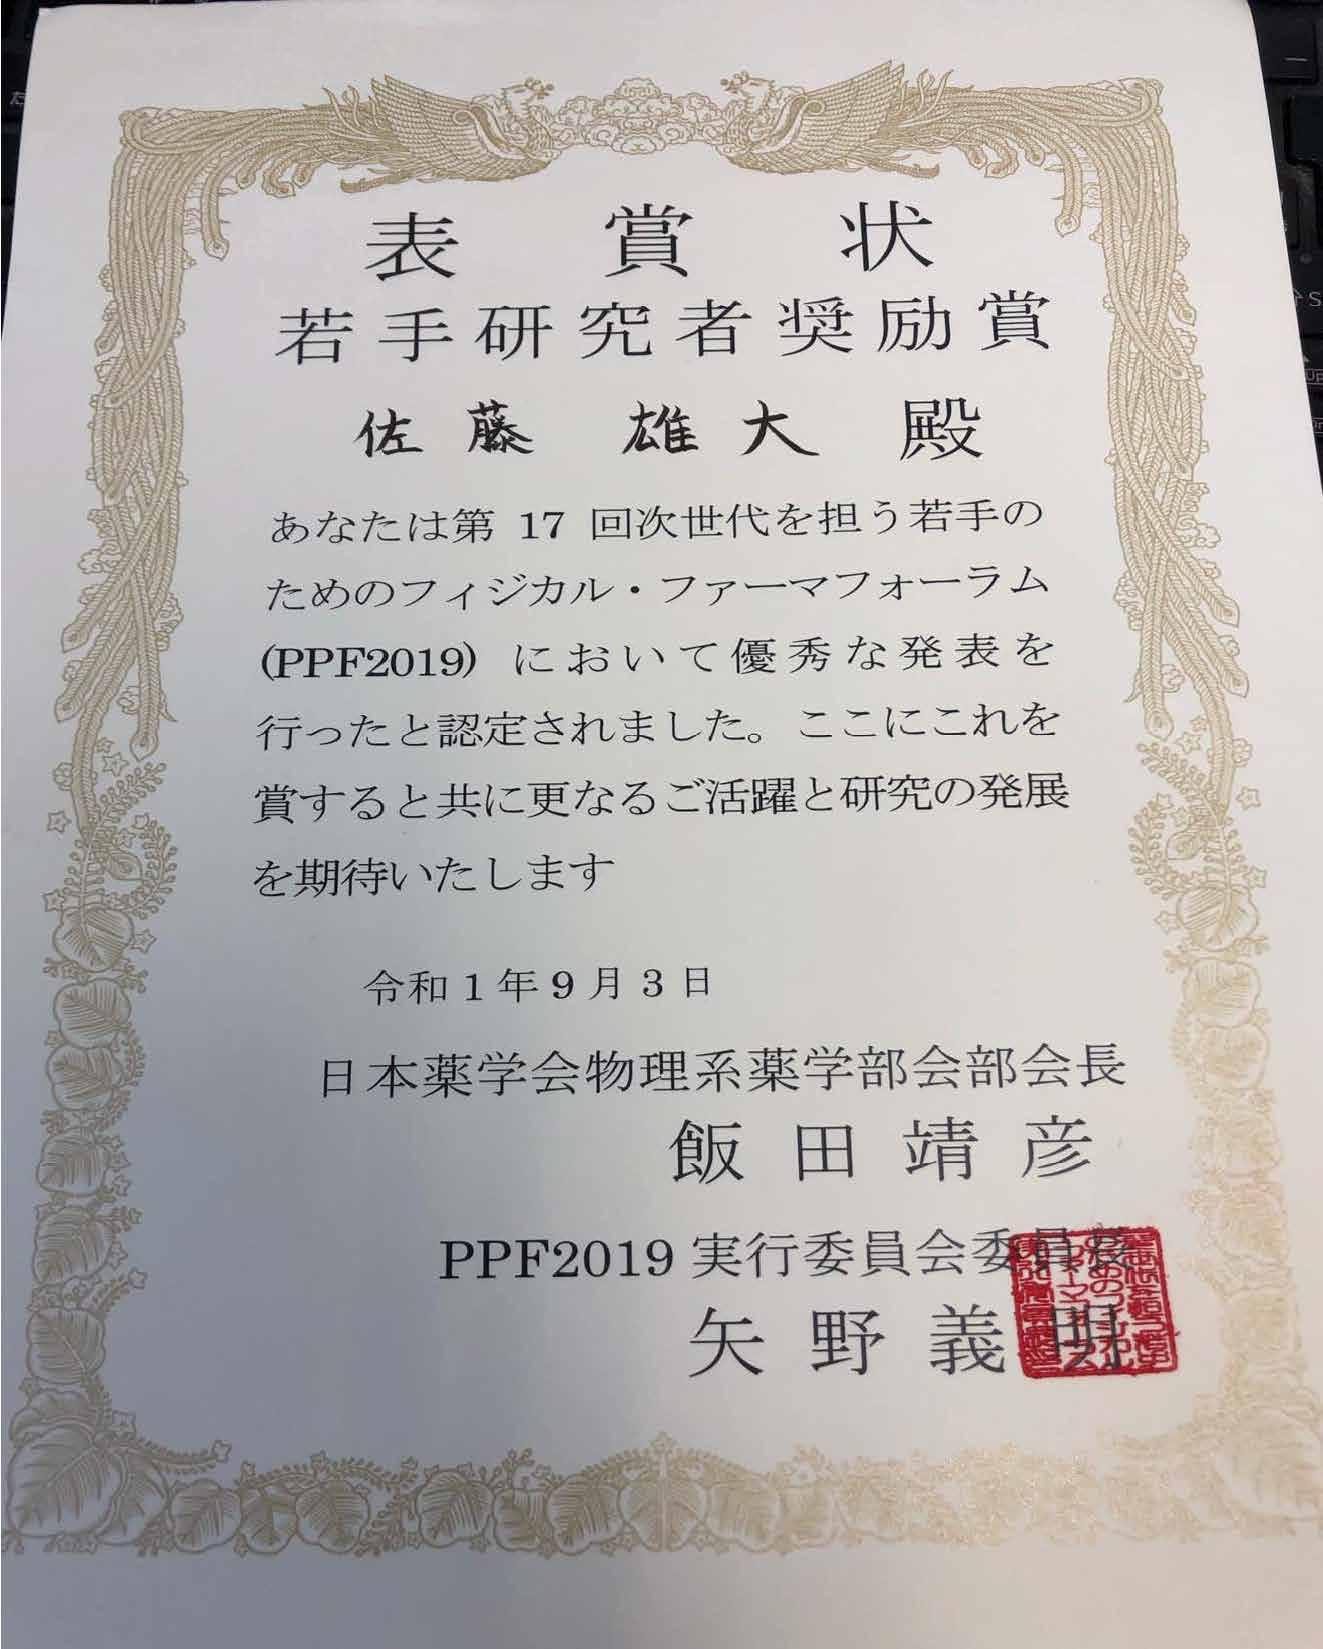 (PPF2019) 賞状